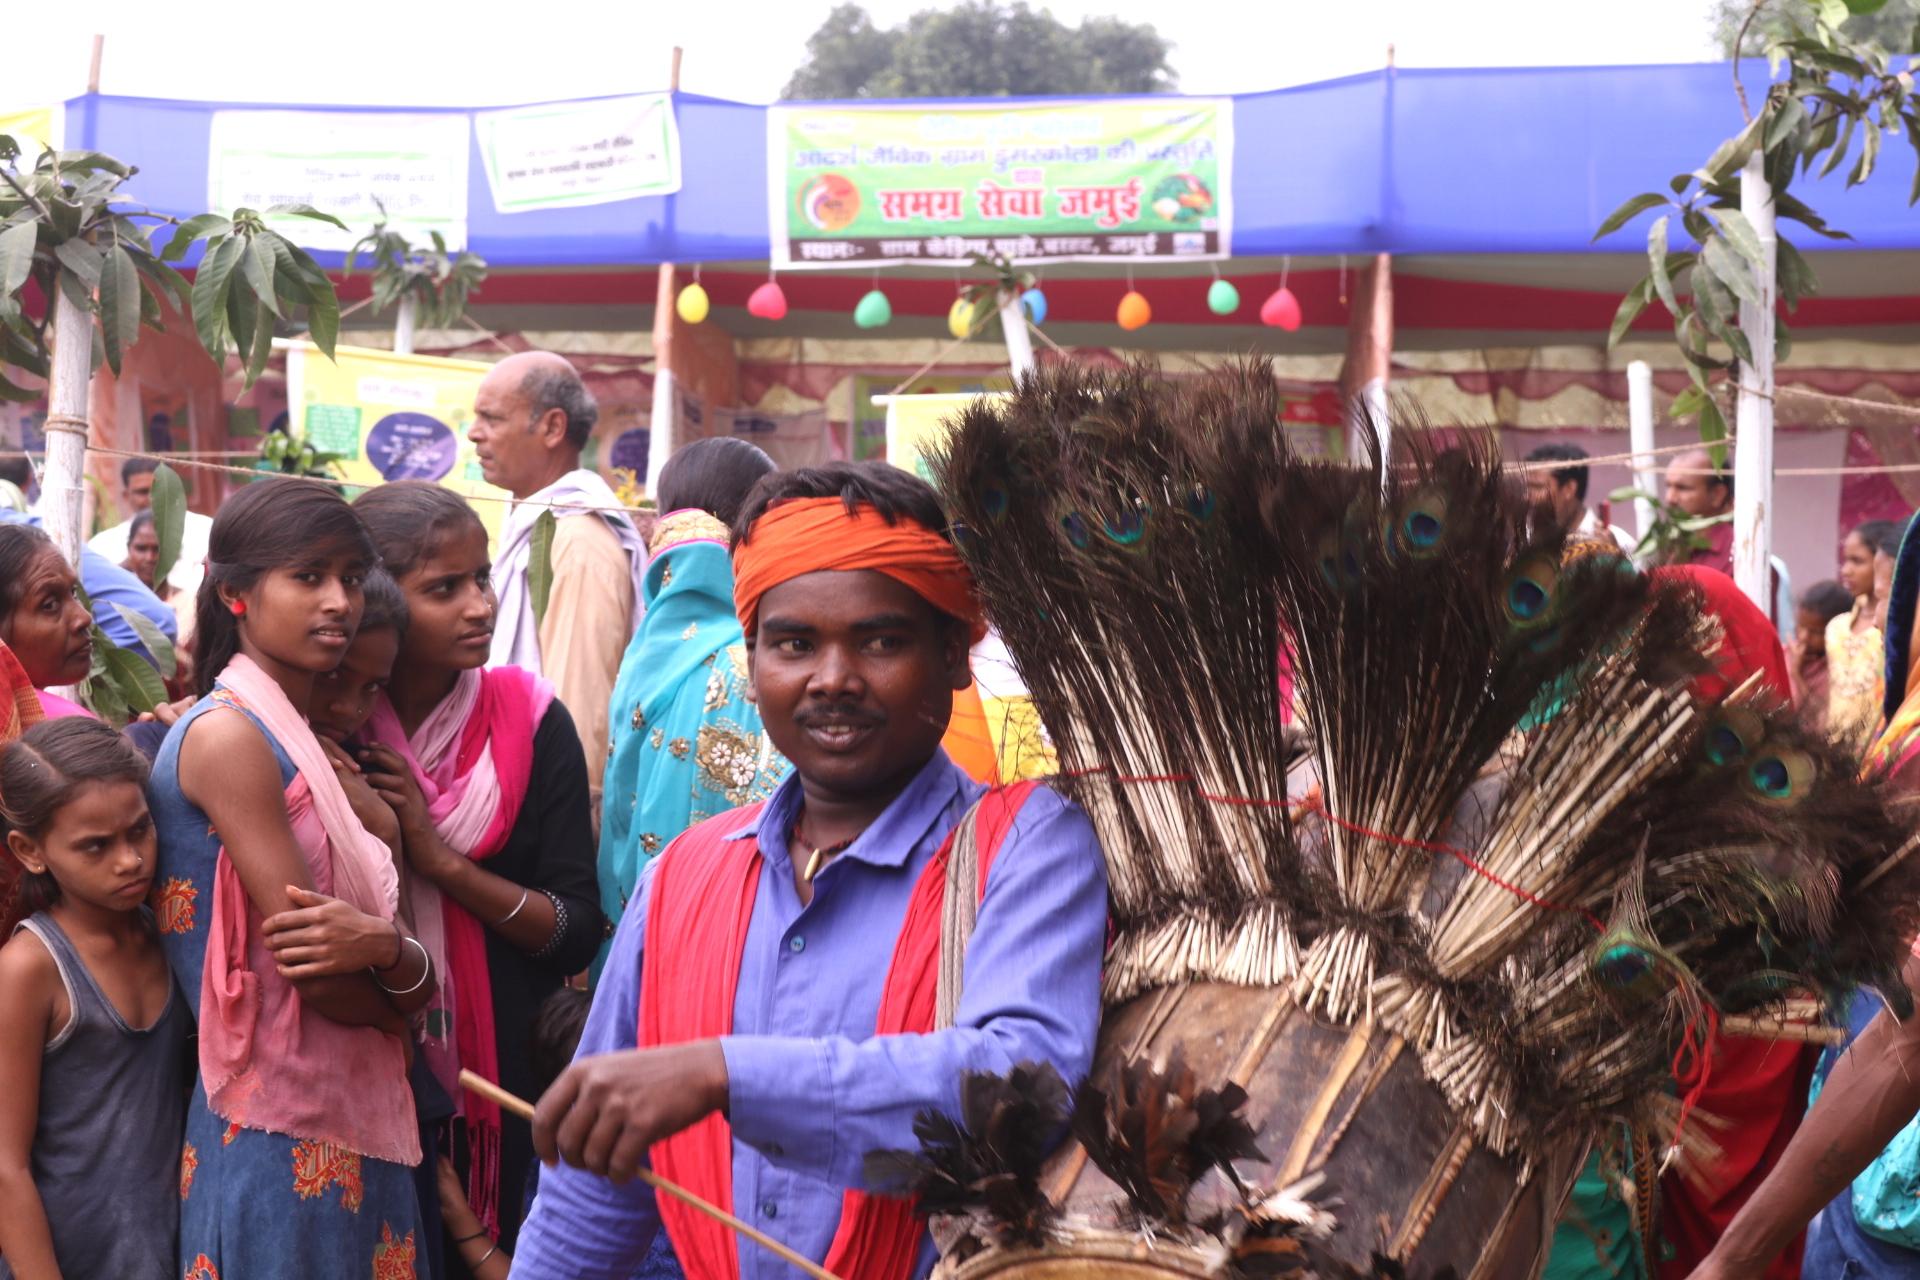 'Jasn-a-jaivik' was organised in Kedia village of Bihar to celebrate organic farming